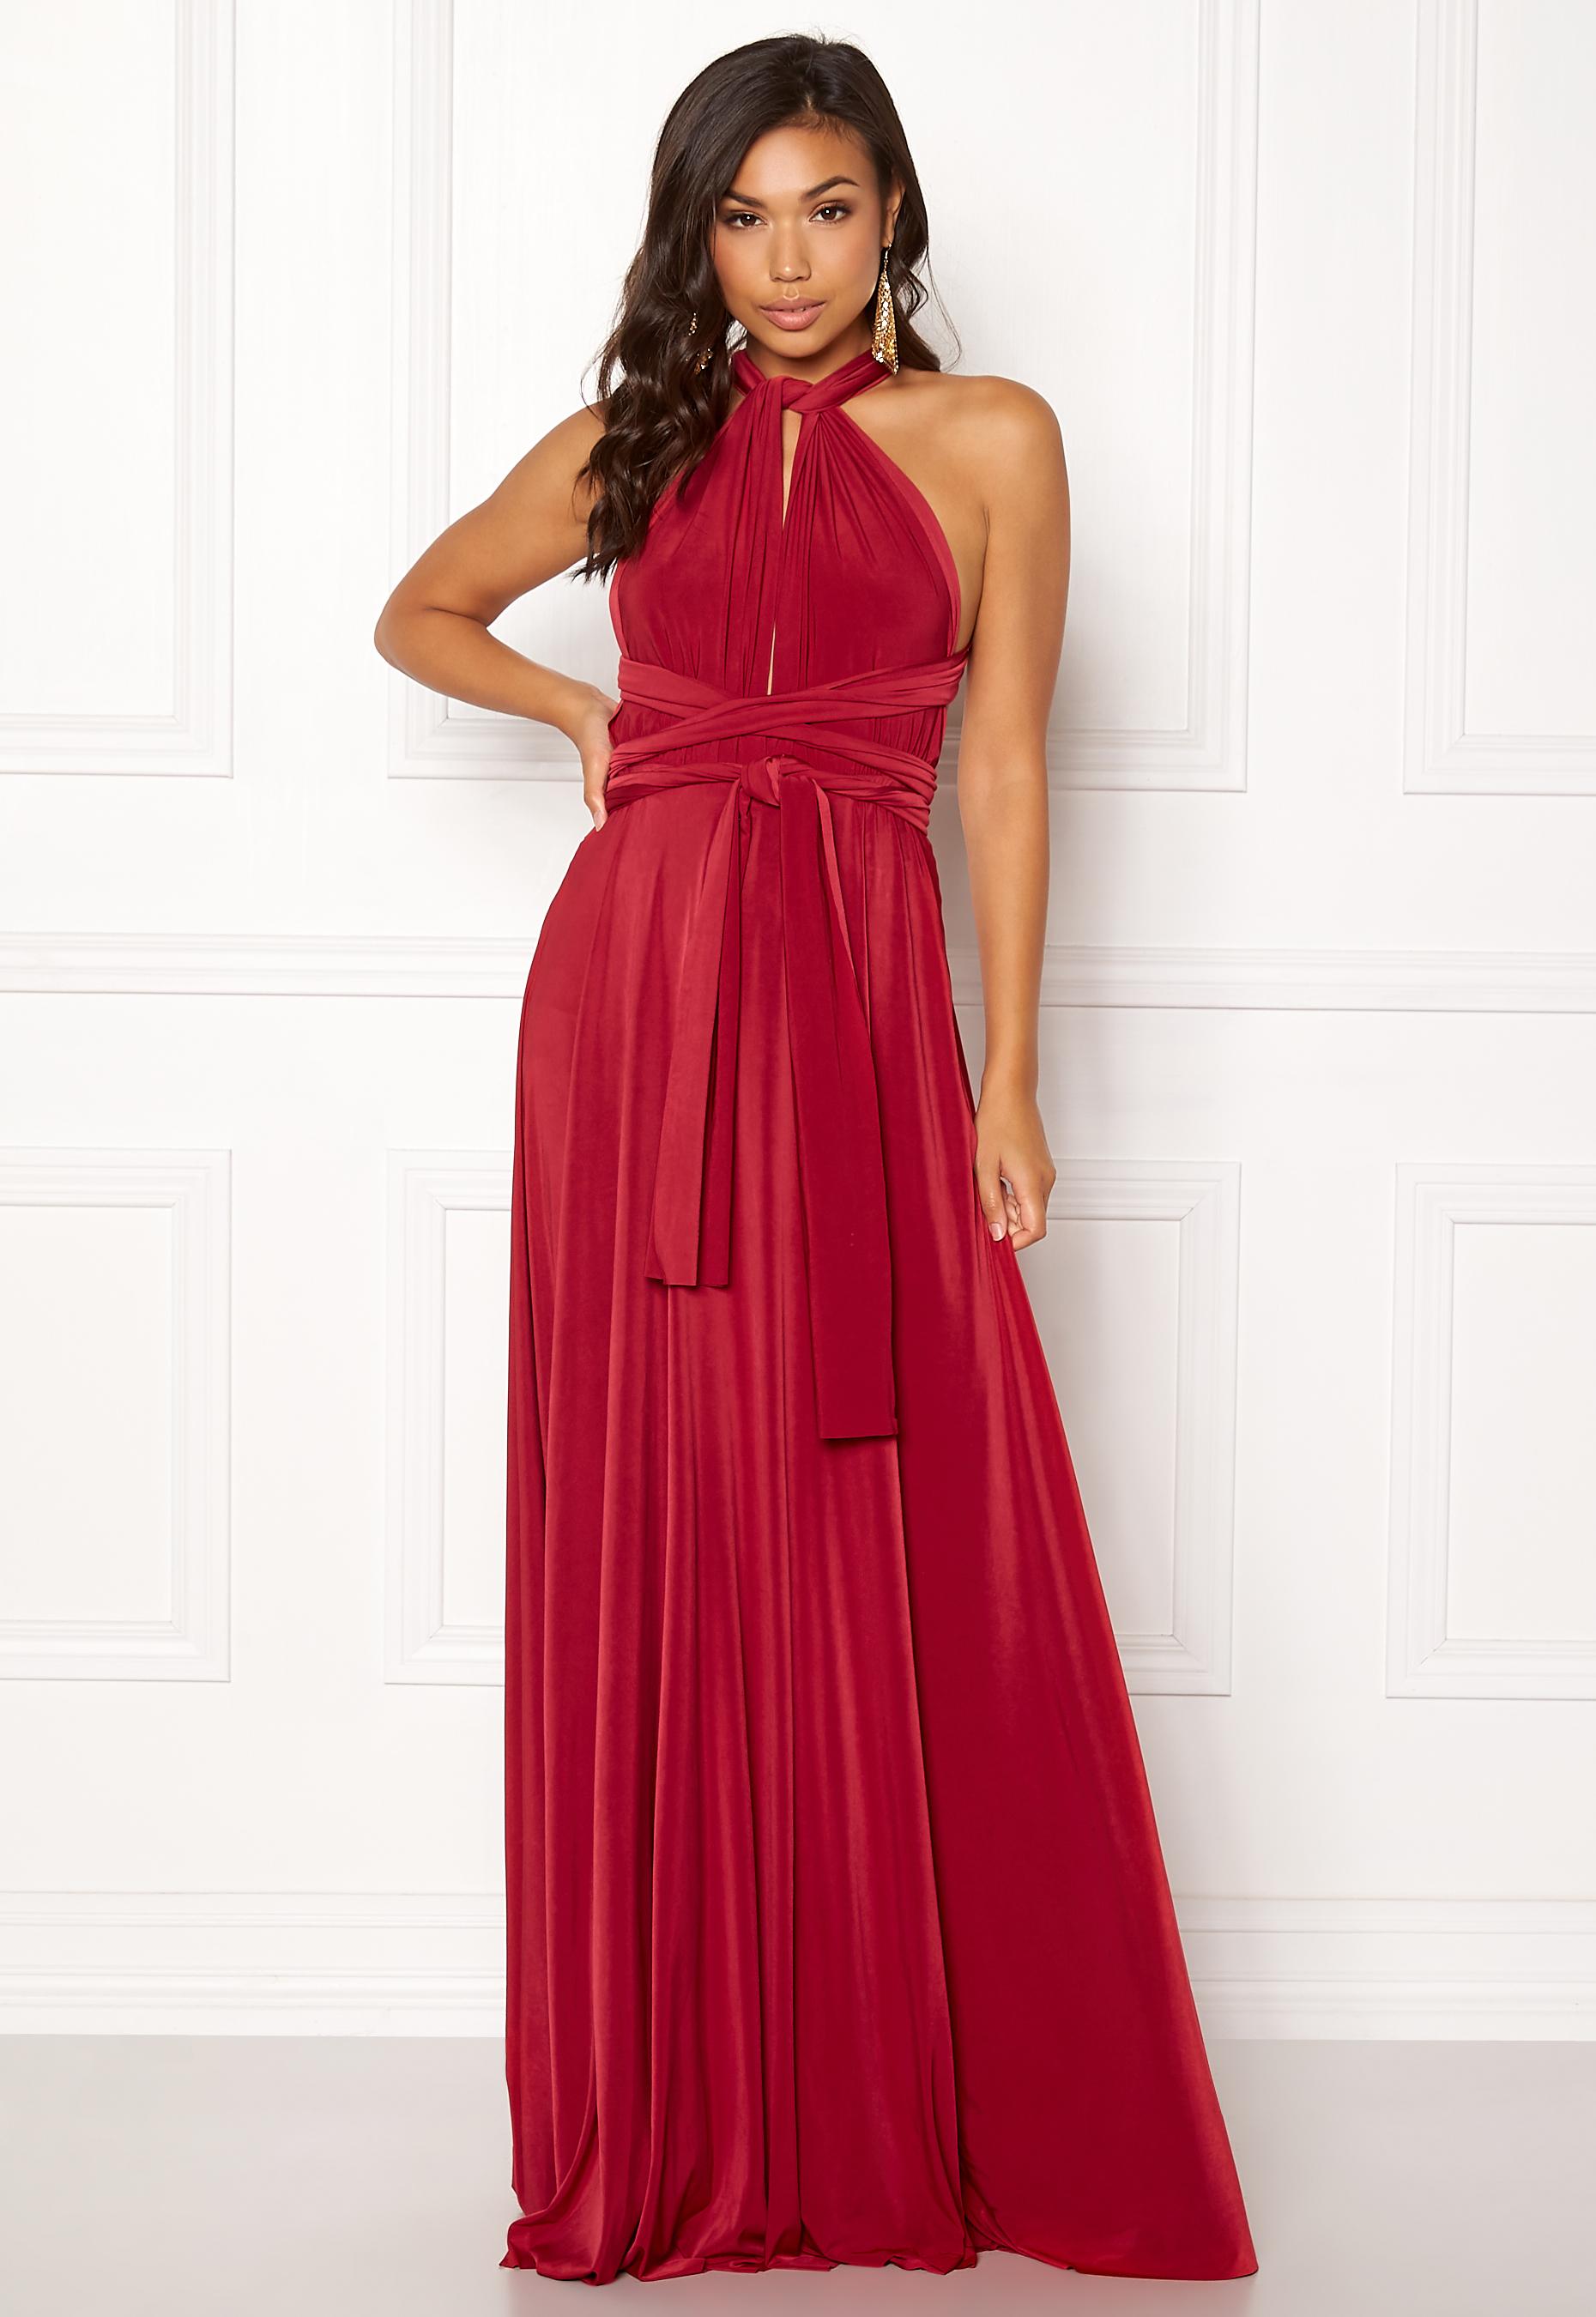 compare price hot-selling professional enjoy clearance price Goddiva Multi Tie Maxi Dress Red - Bubbleroom